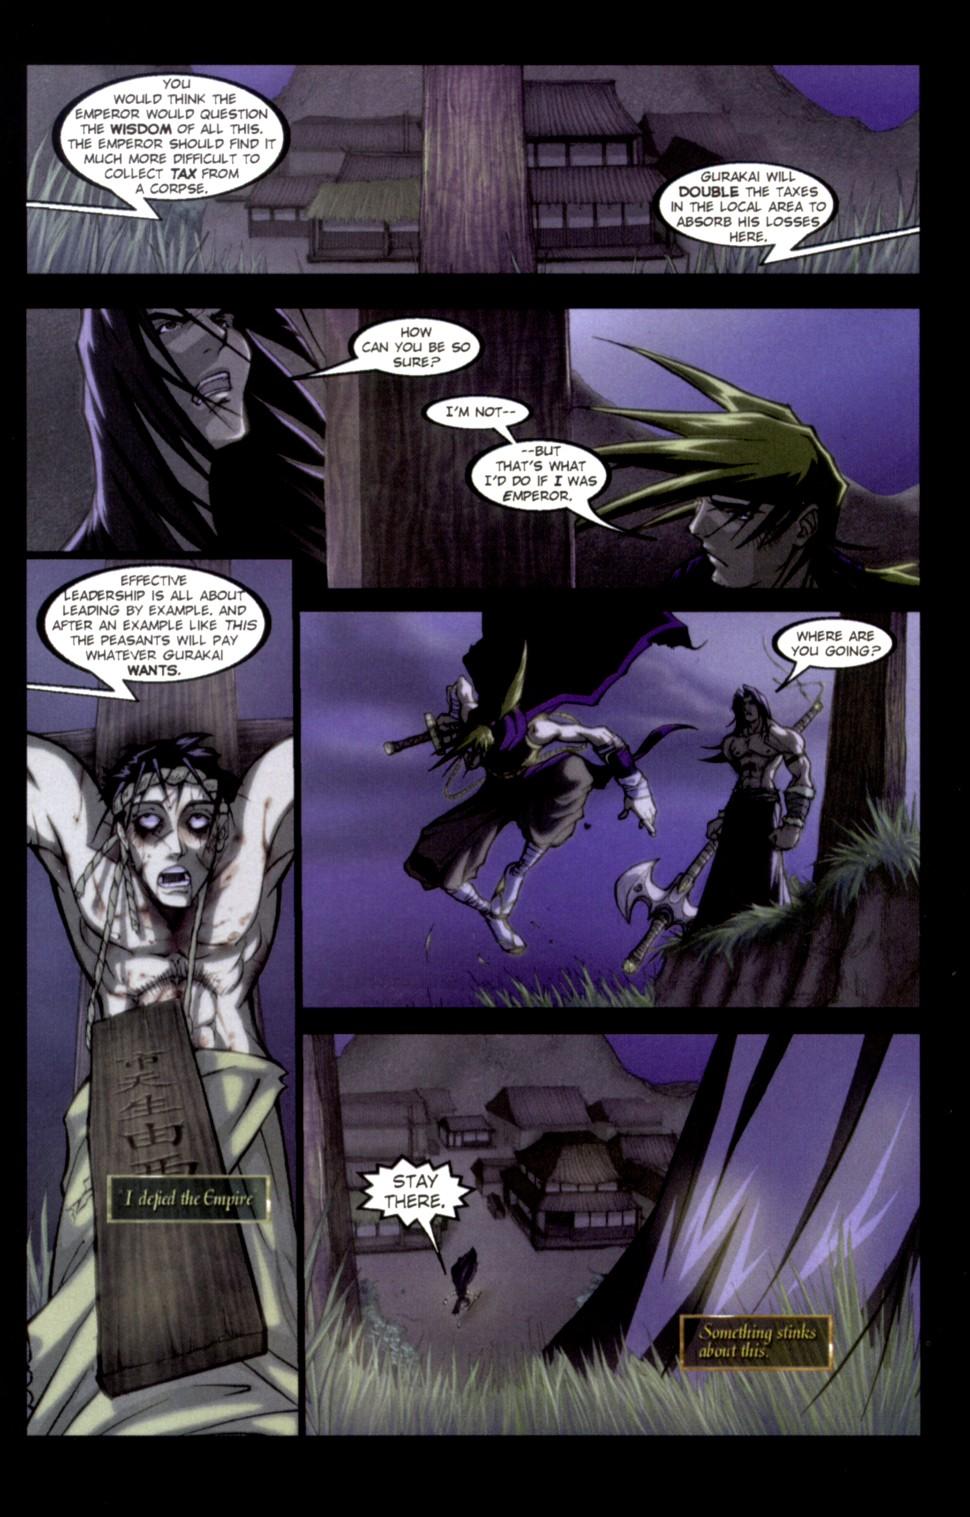 Read online Shidima comic -  Issue #1 - 16